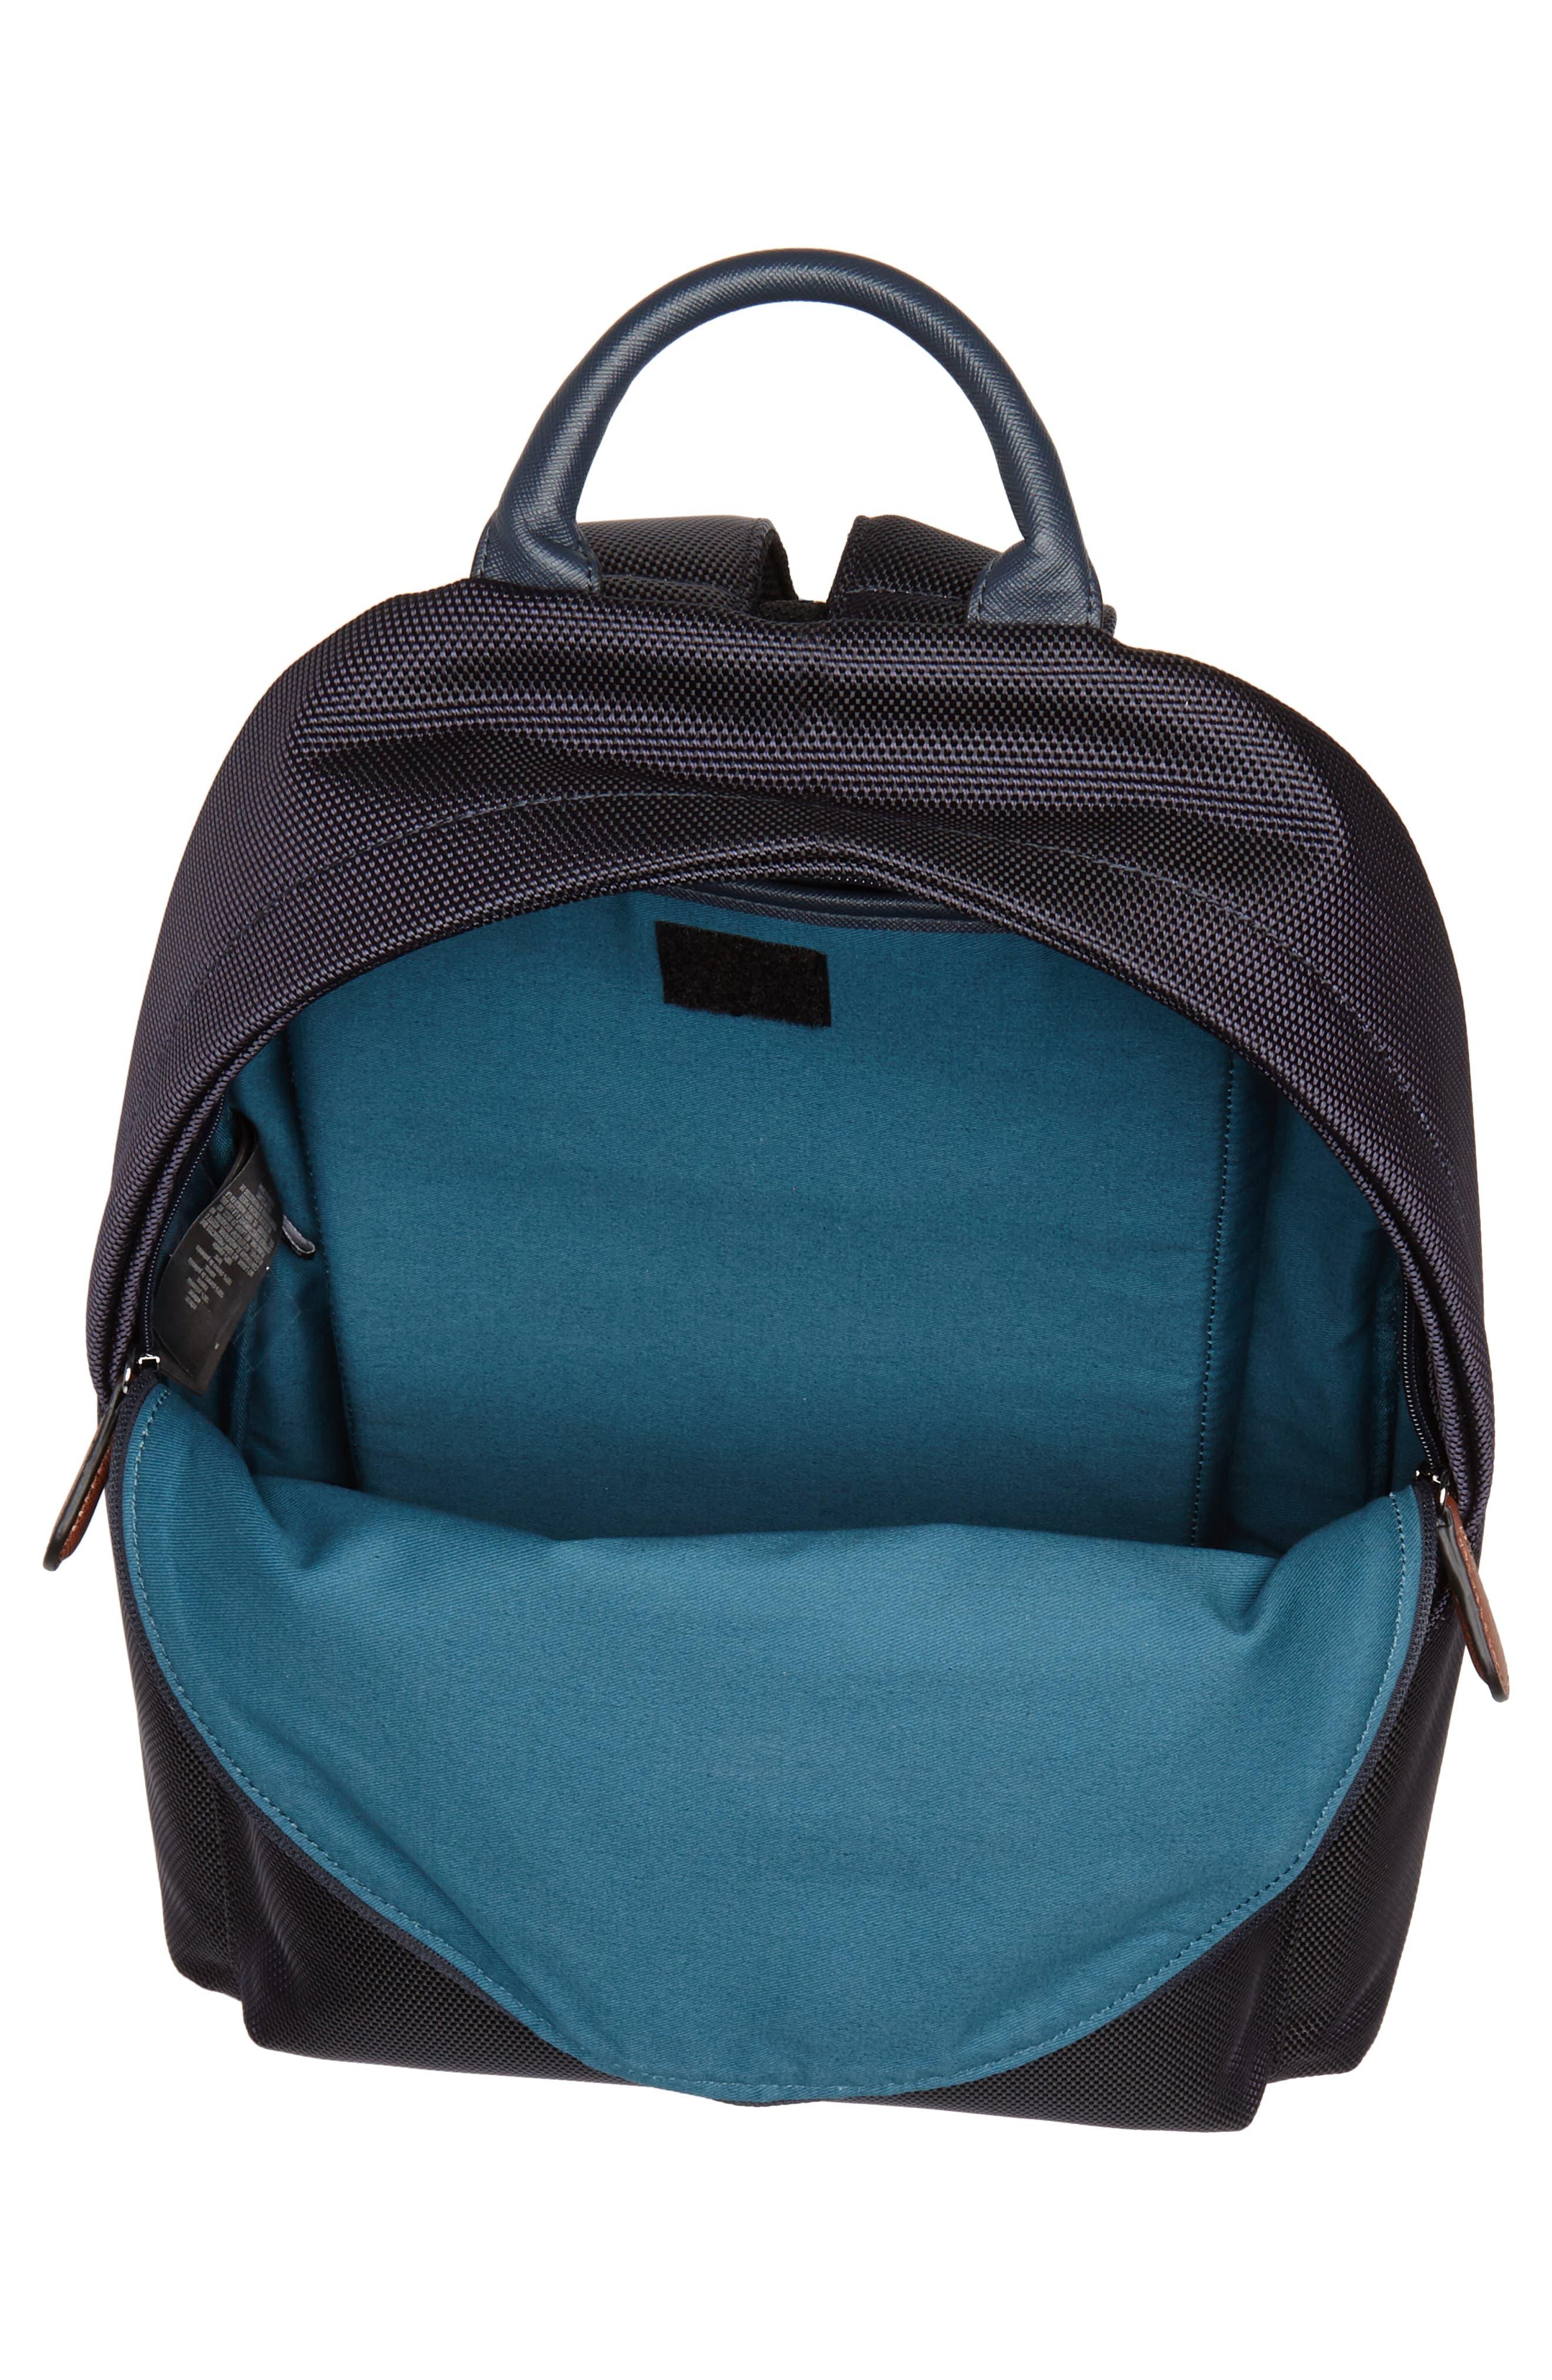 Brakes Backpack,                             Alternate thumbnail 4, color,                             410